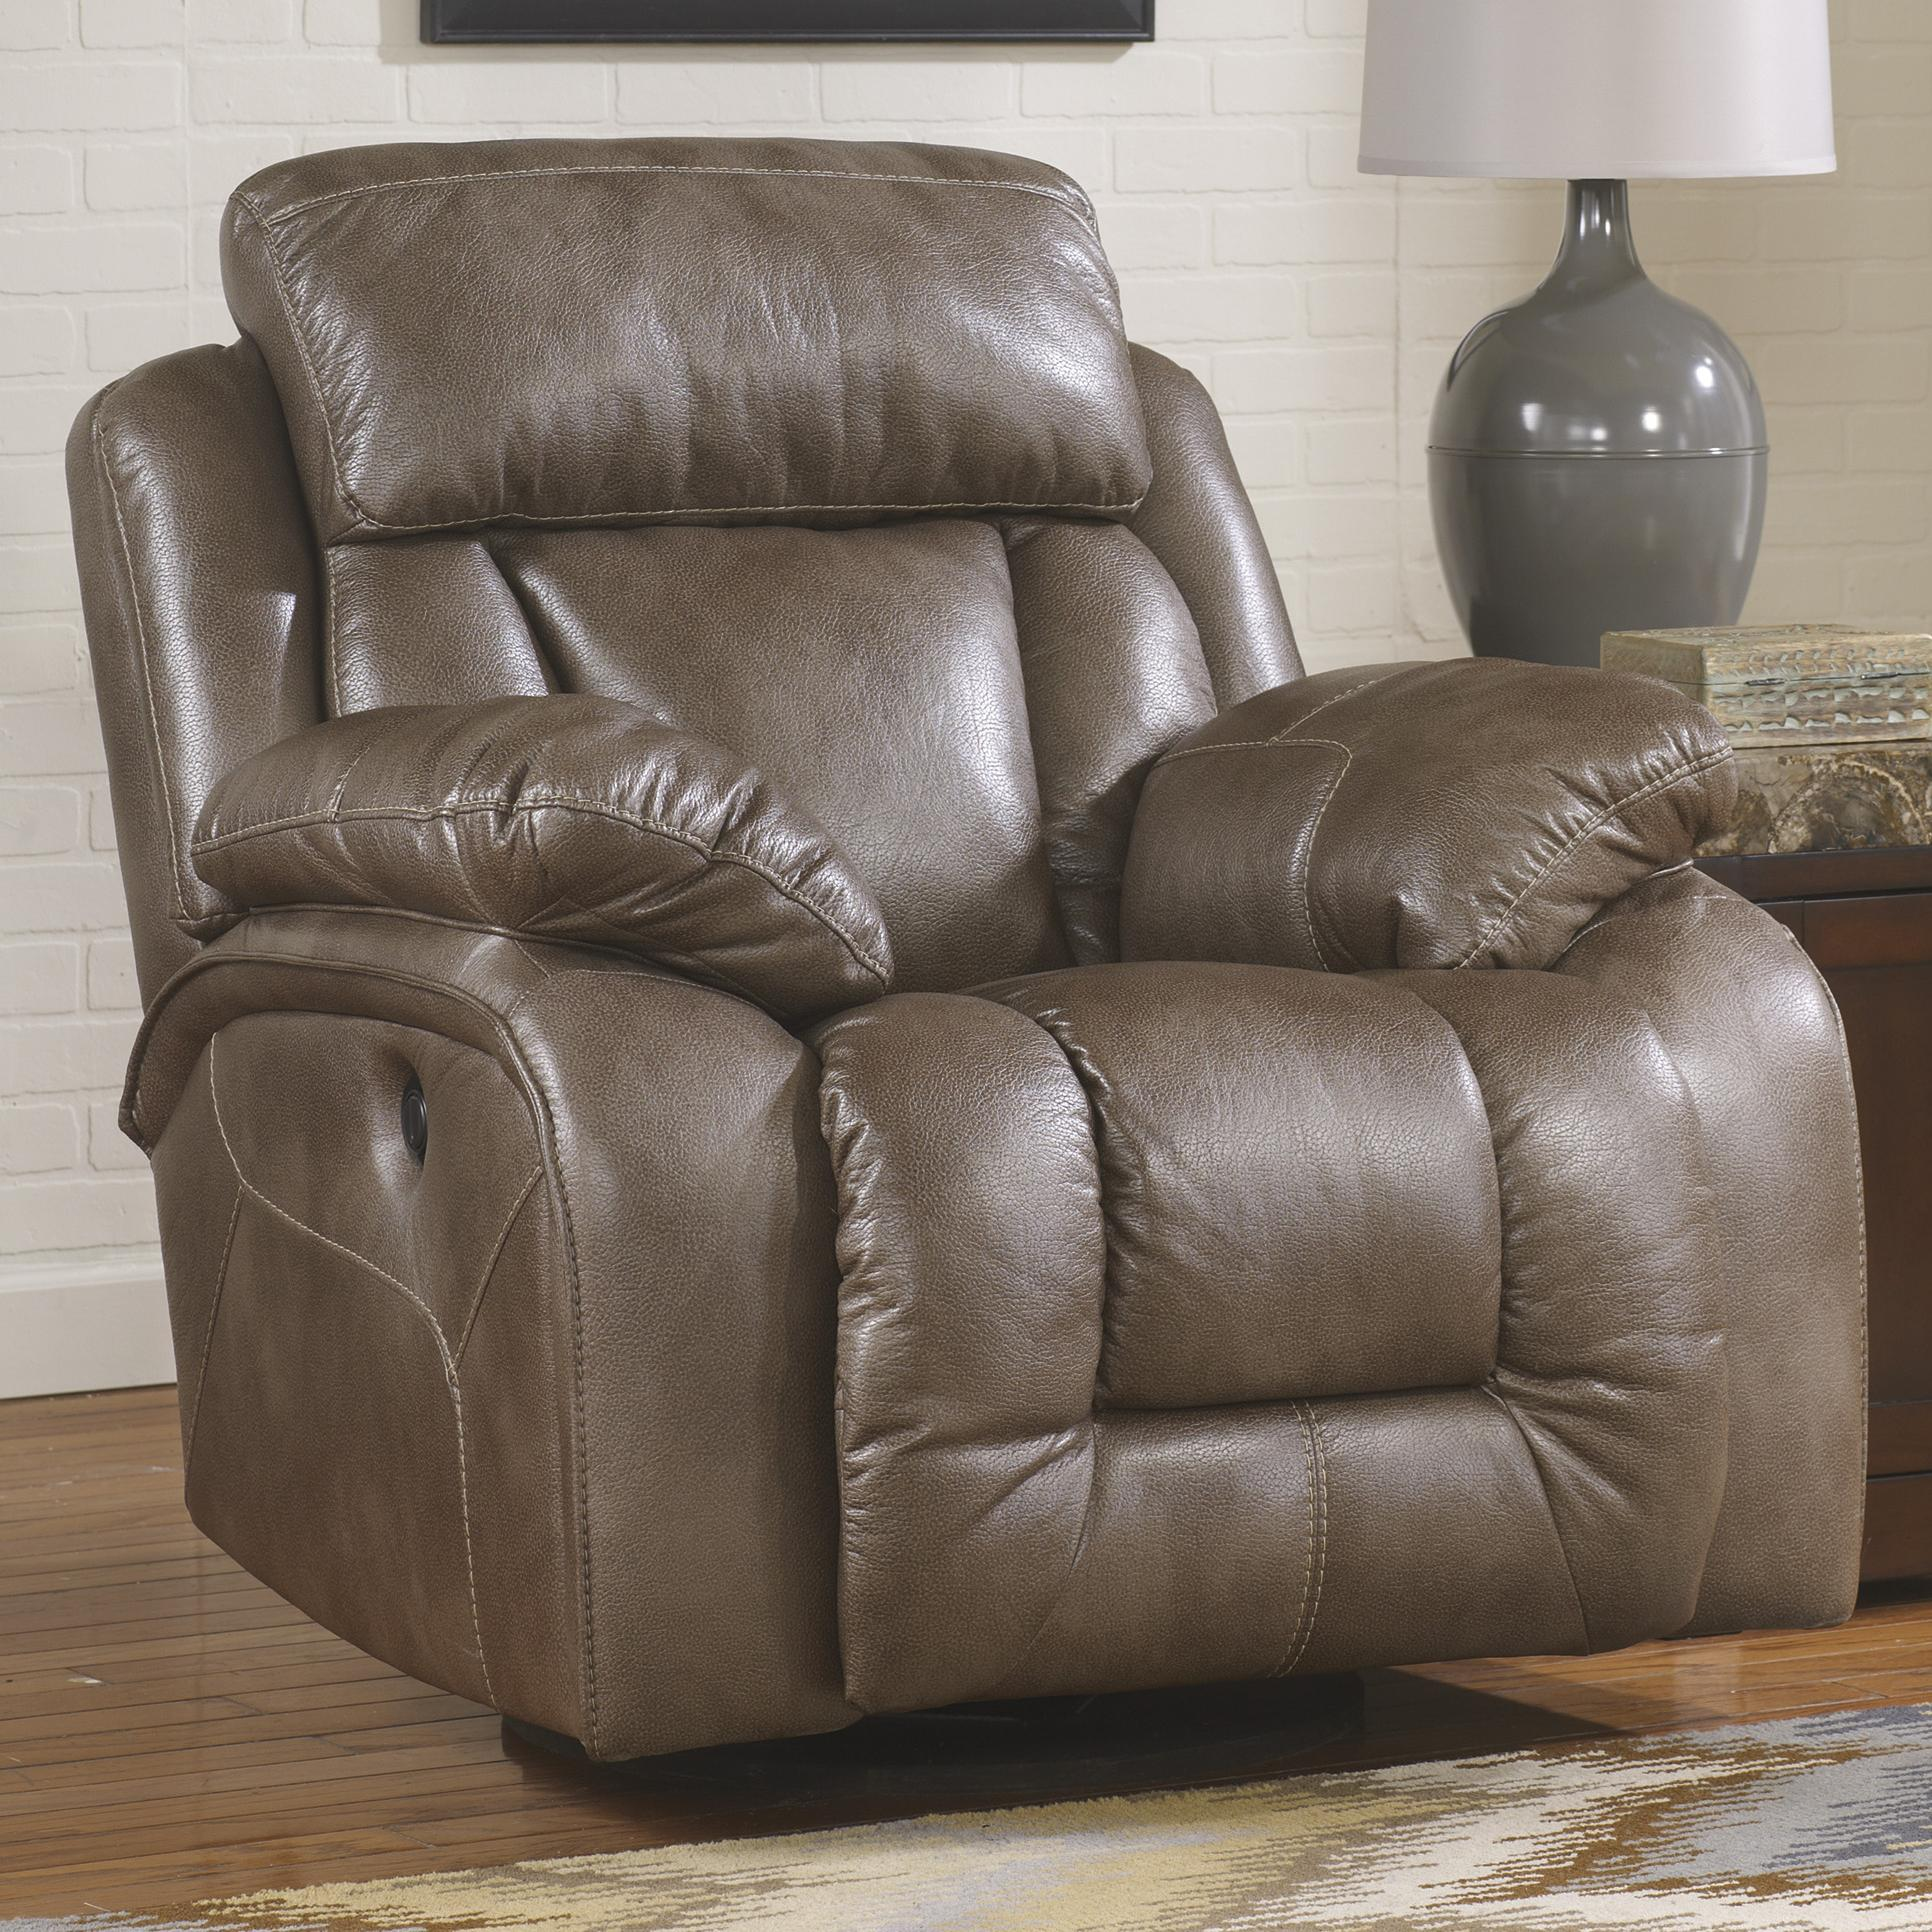 Ashley Furniture Loral - Sable Swivel Power Rocker Recliner - Item Number: 4220032